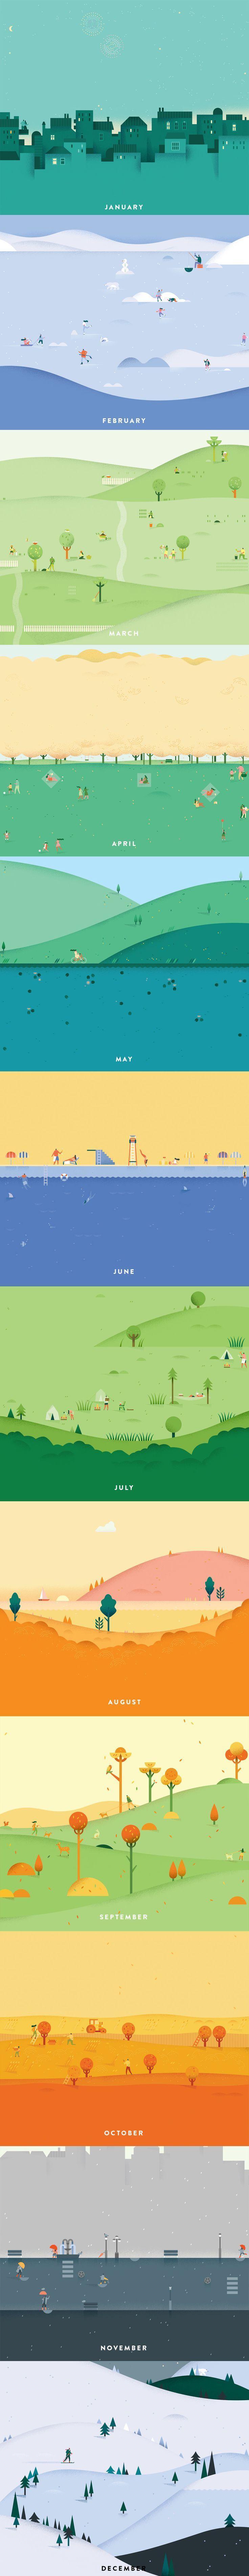 Google calendar illustrations